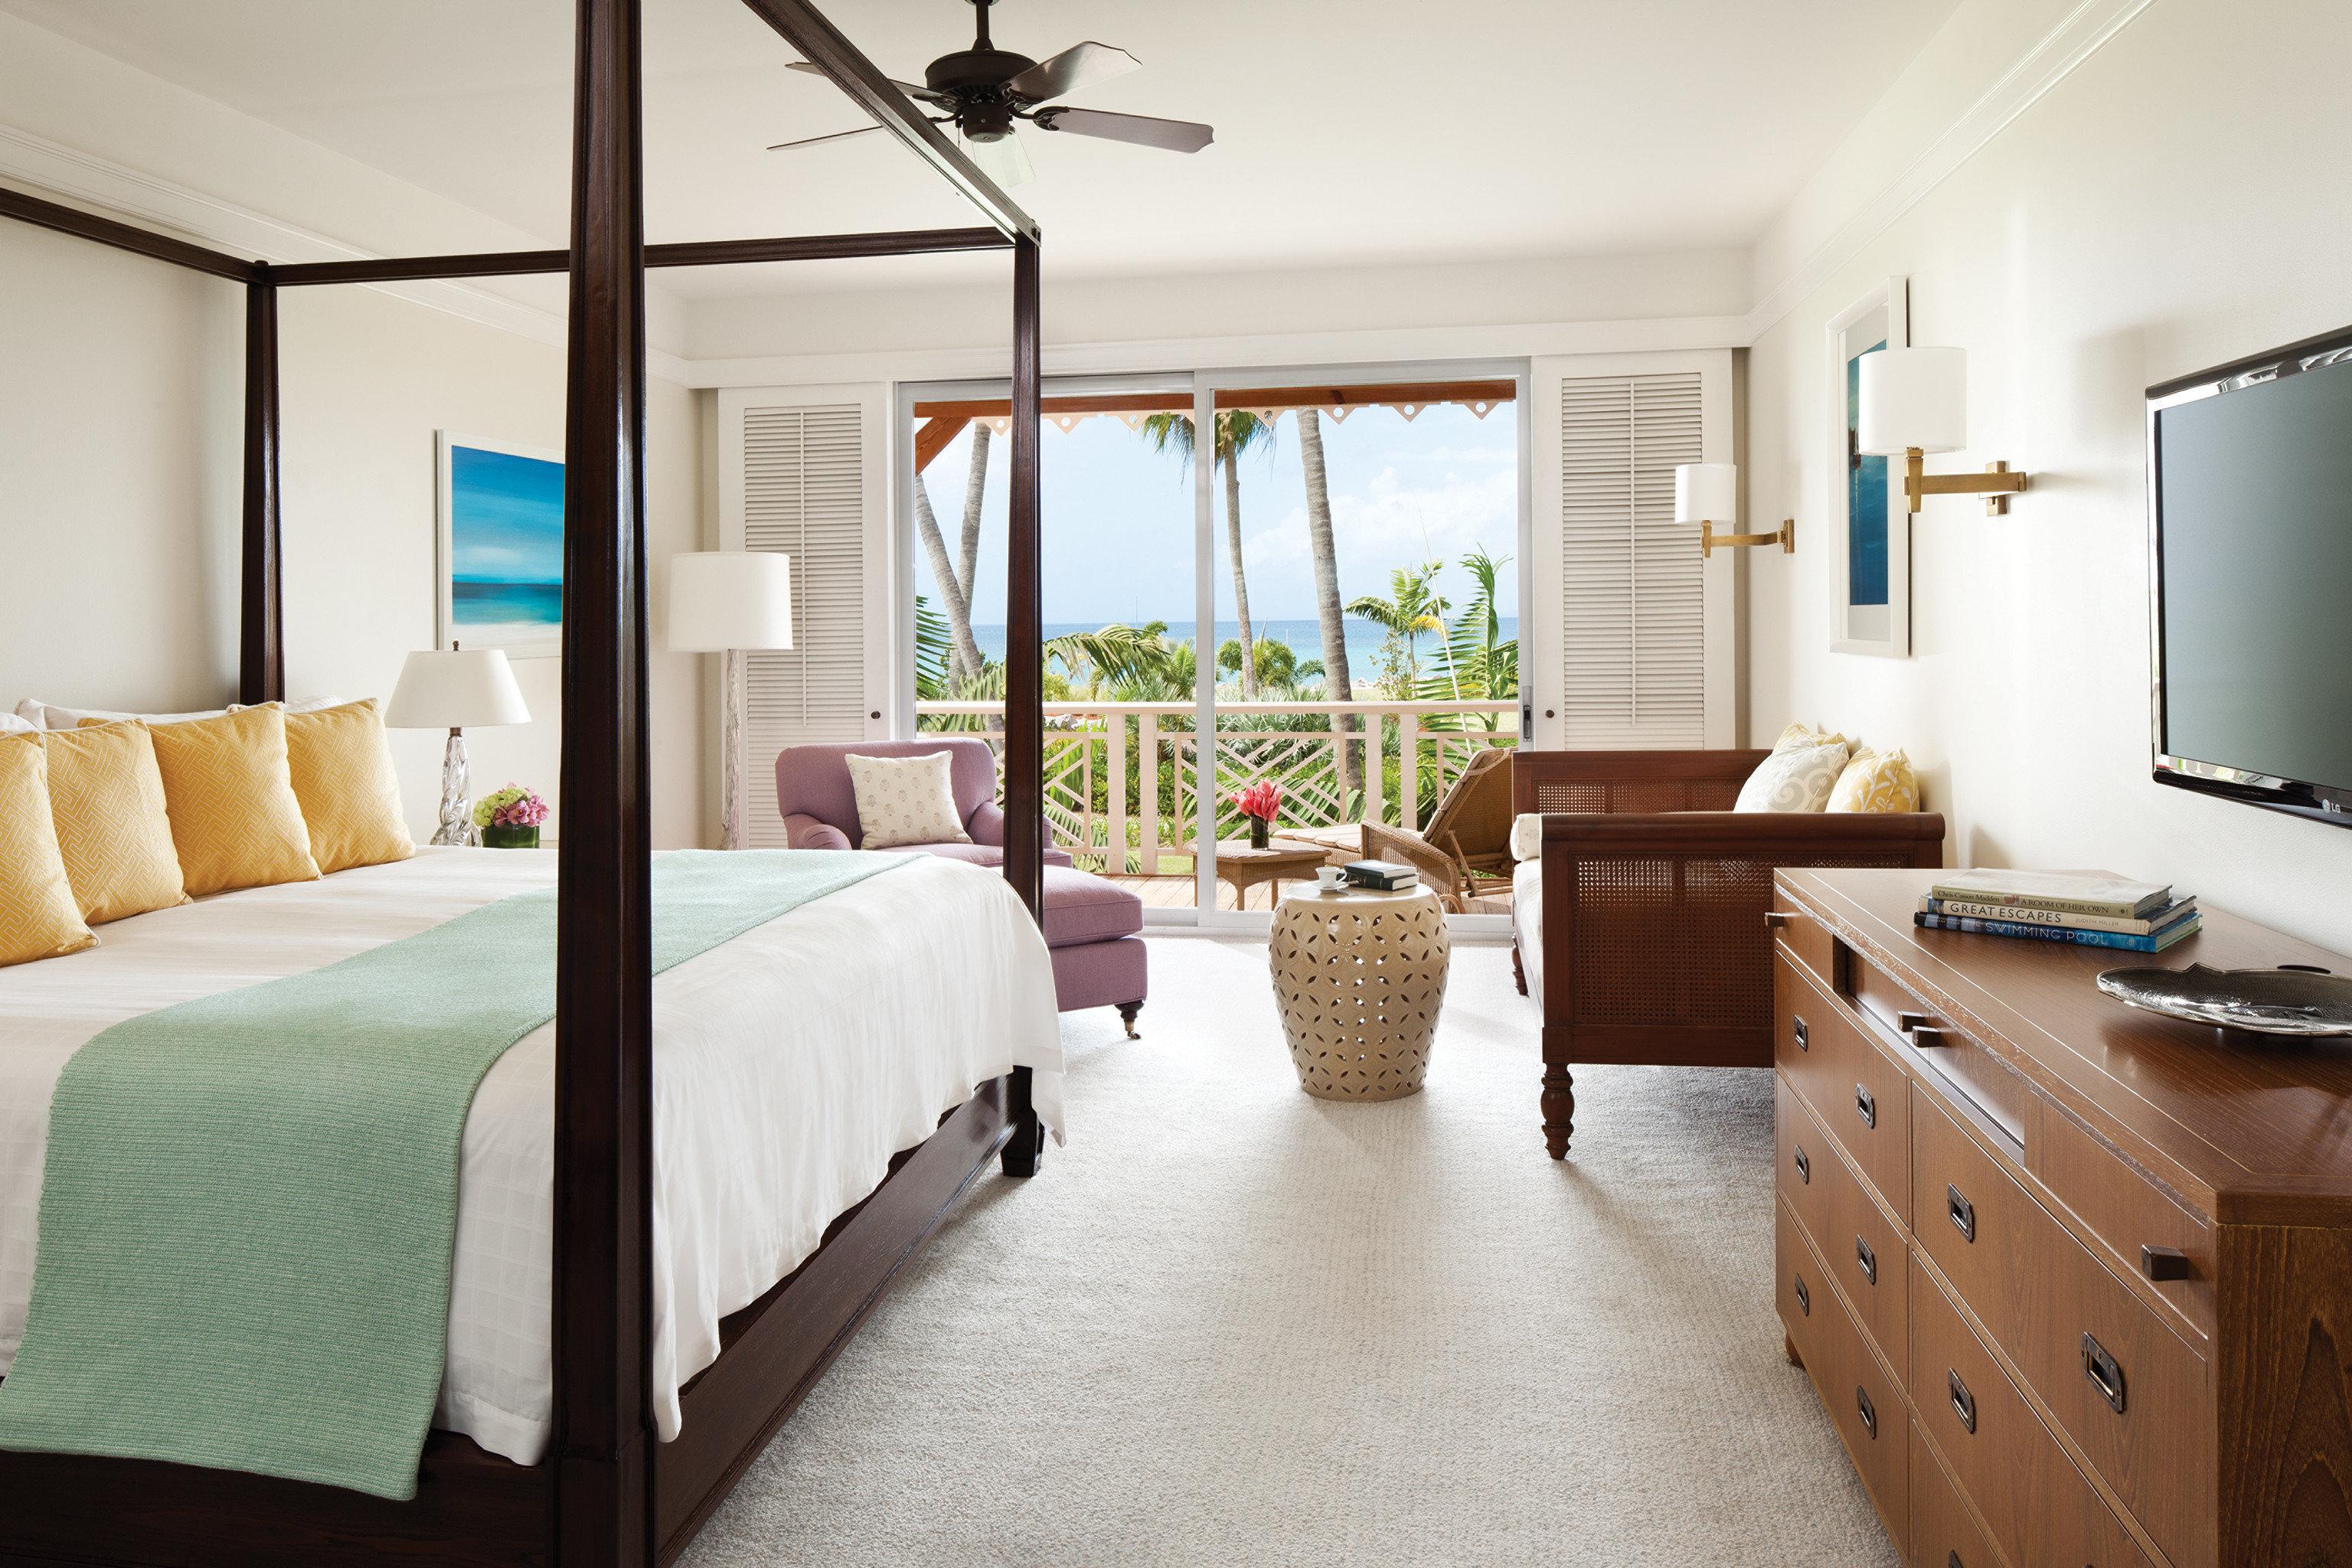 Bedroom Hip Lounge Suite Trip Ideas property home living room cottage hardwood farmhouse